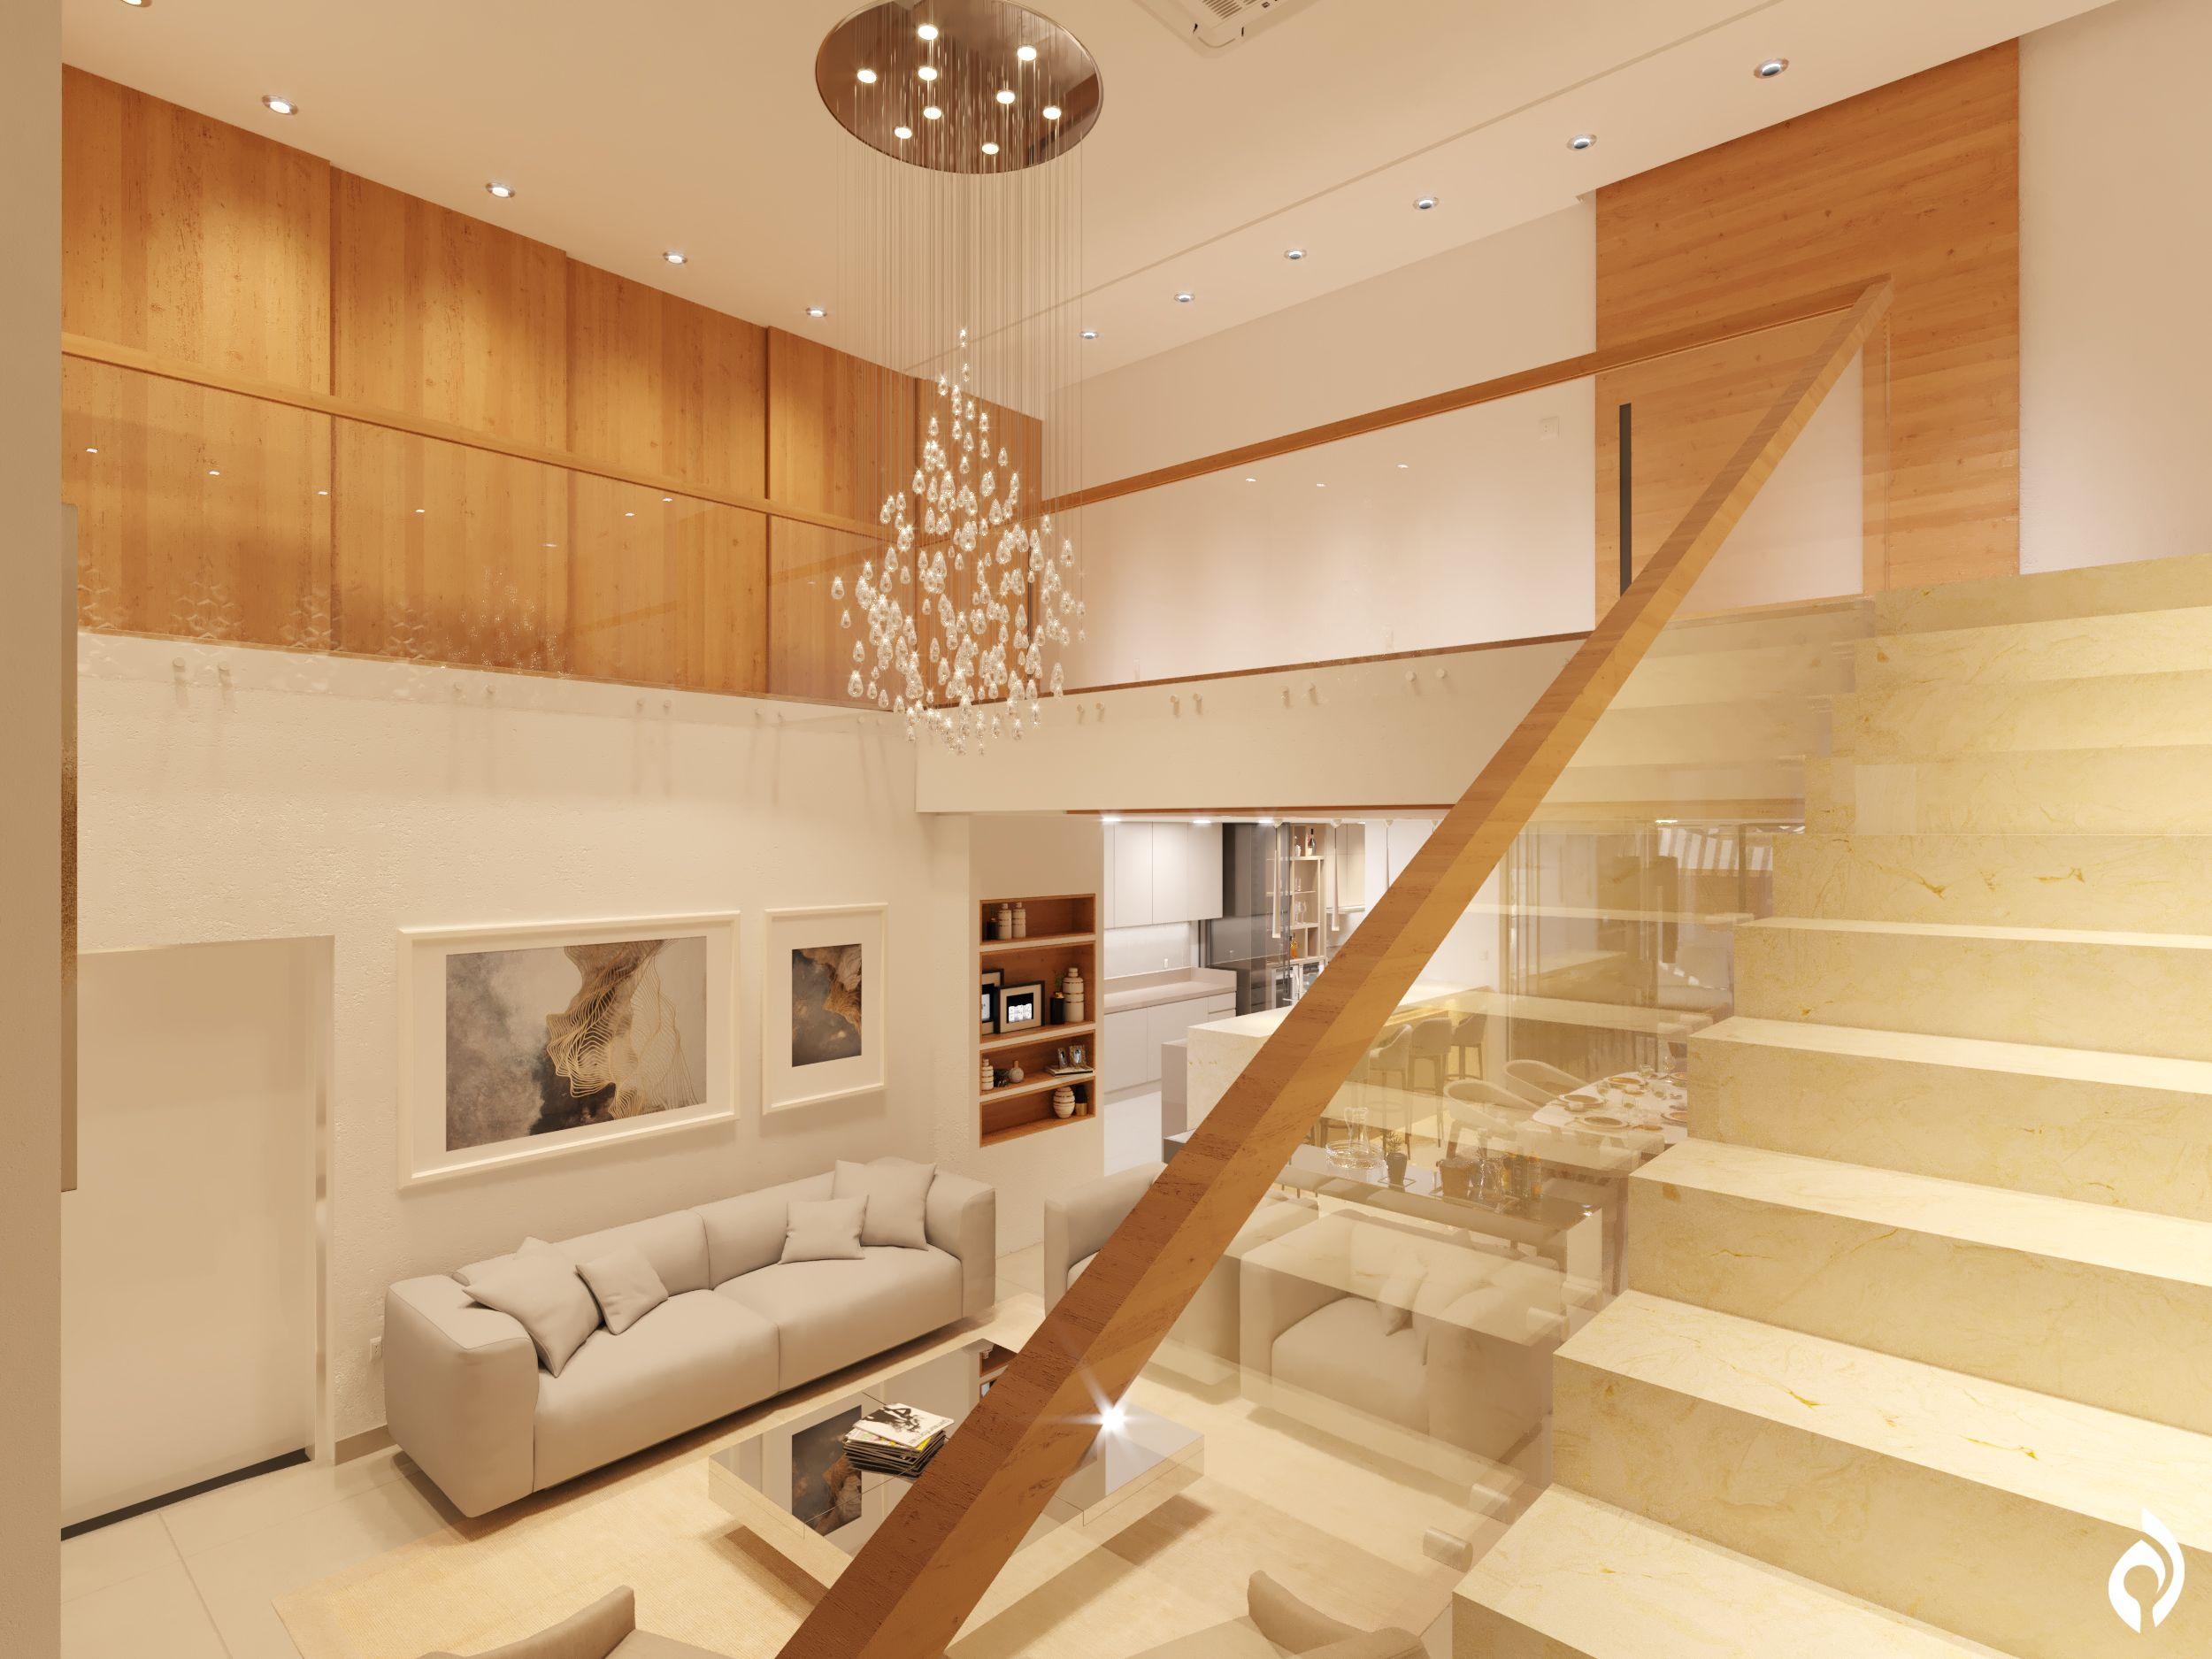 Arquitetura De Interiores Av #Arquitetura #Interiores #Arquiteto #Sala #P Direito